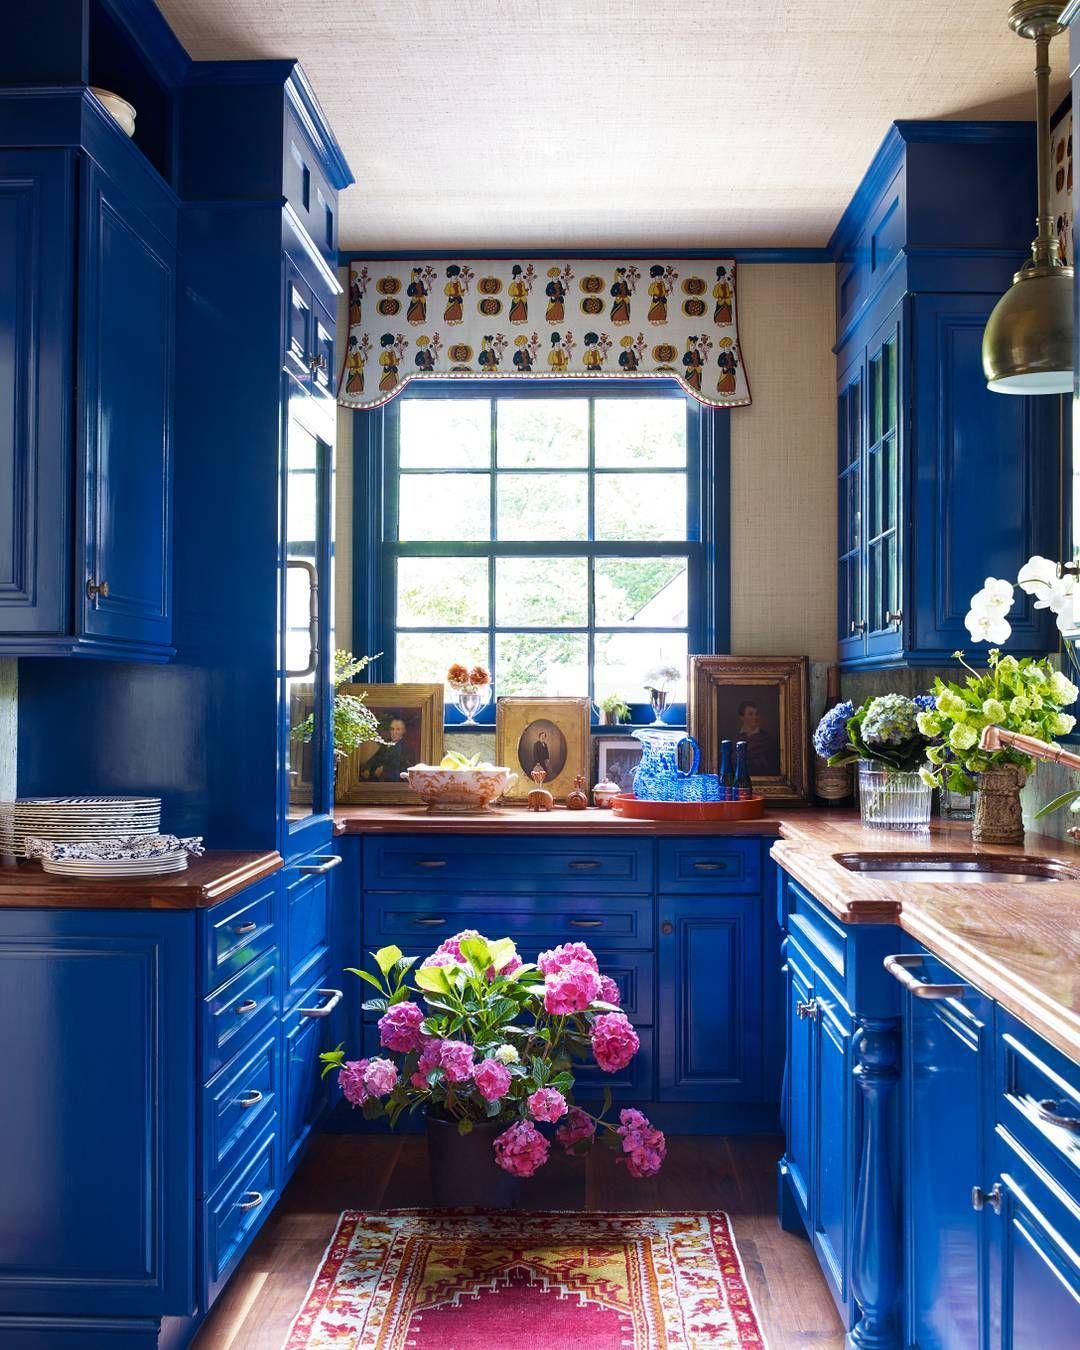 Veranda Magazine On Instagram Lacquered Cabinets Electrify The Butler S Pantry Photo Williamwaldro Blue Kitchen Cabinets Kitchen Design Bohemian Kitchen